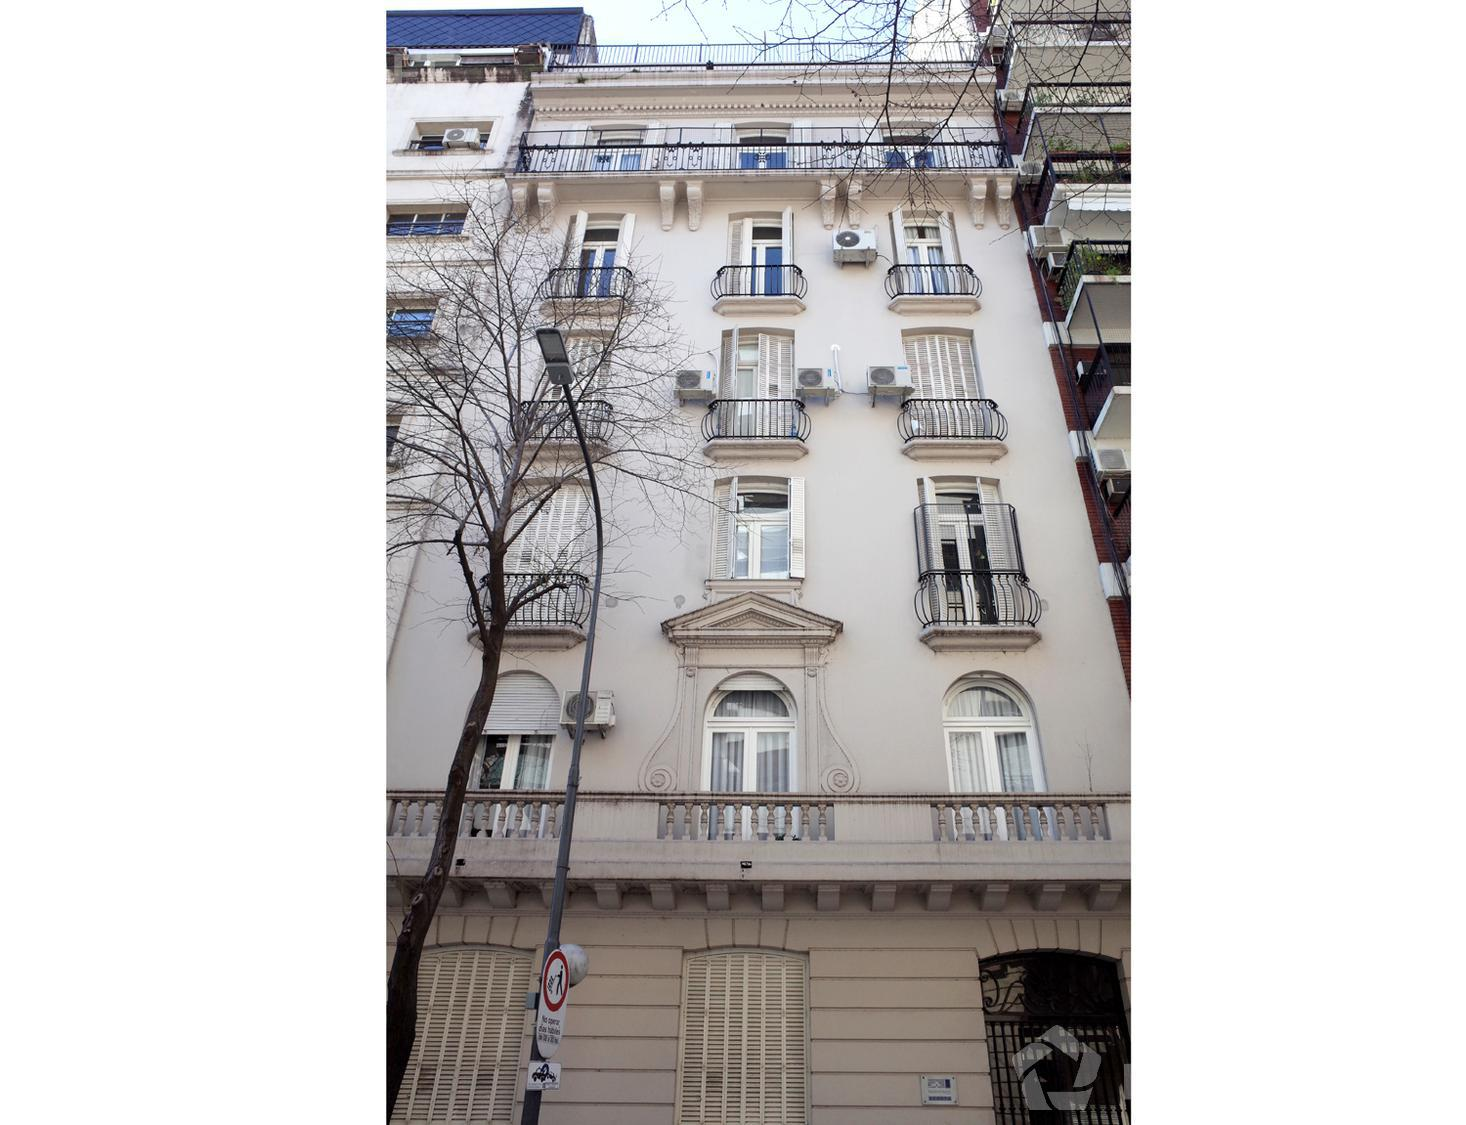 Departamento-Venta-Recoleta-Quintana e/ Montevideo y Parera